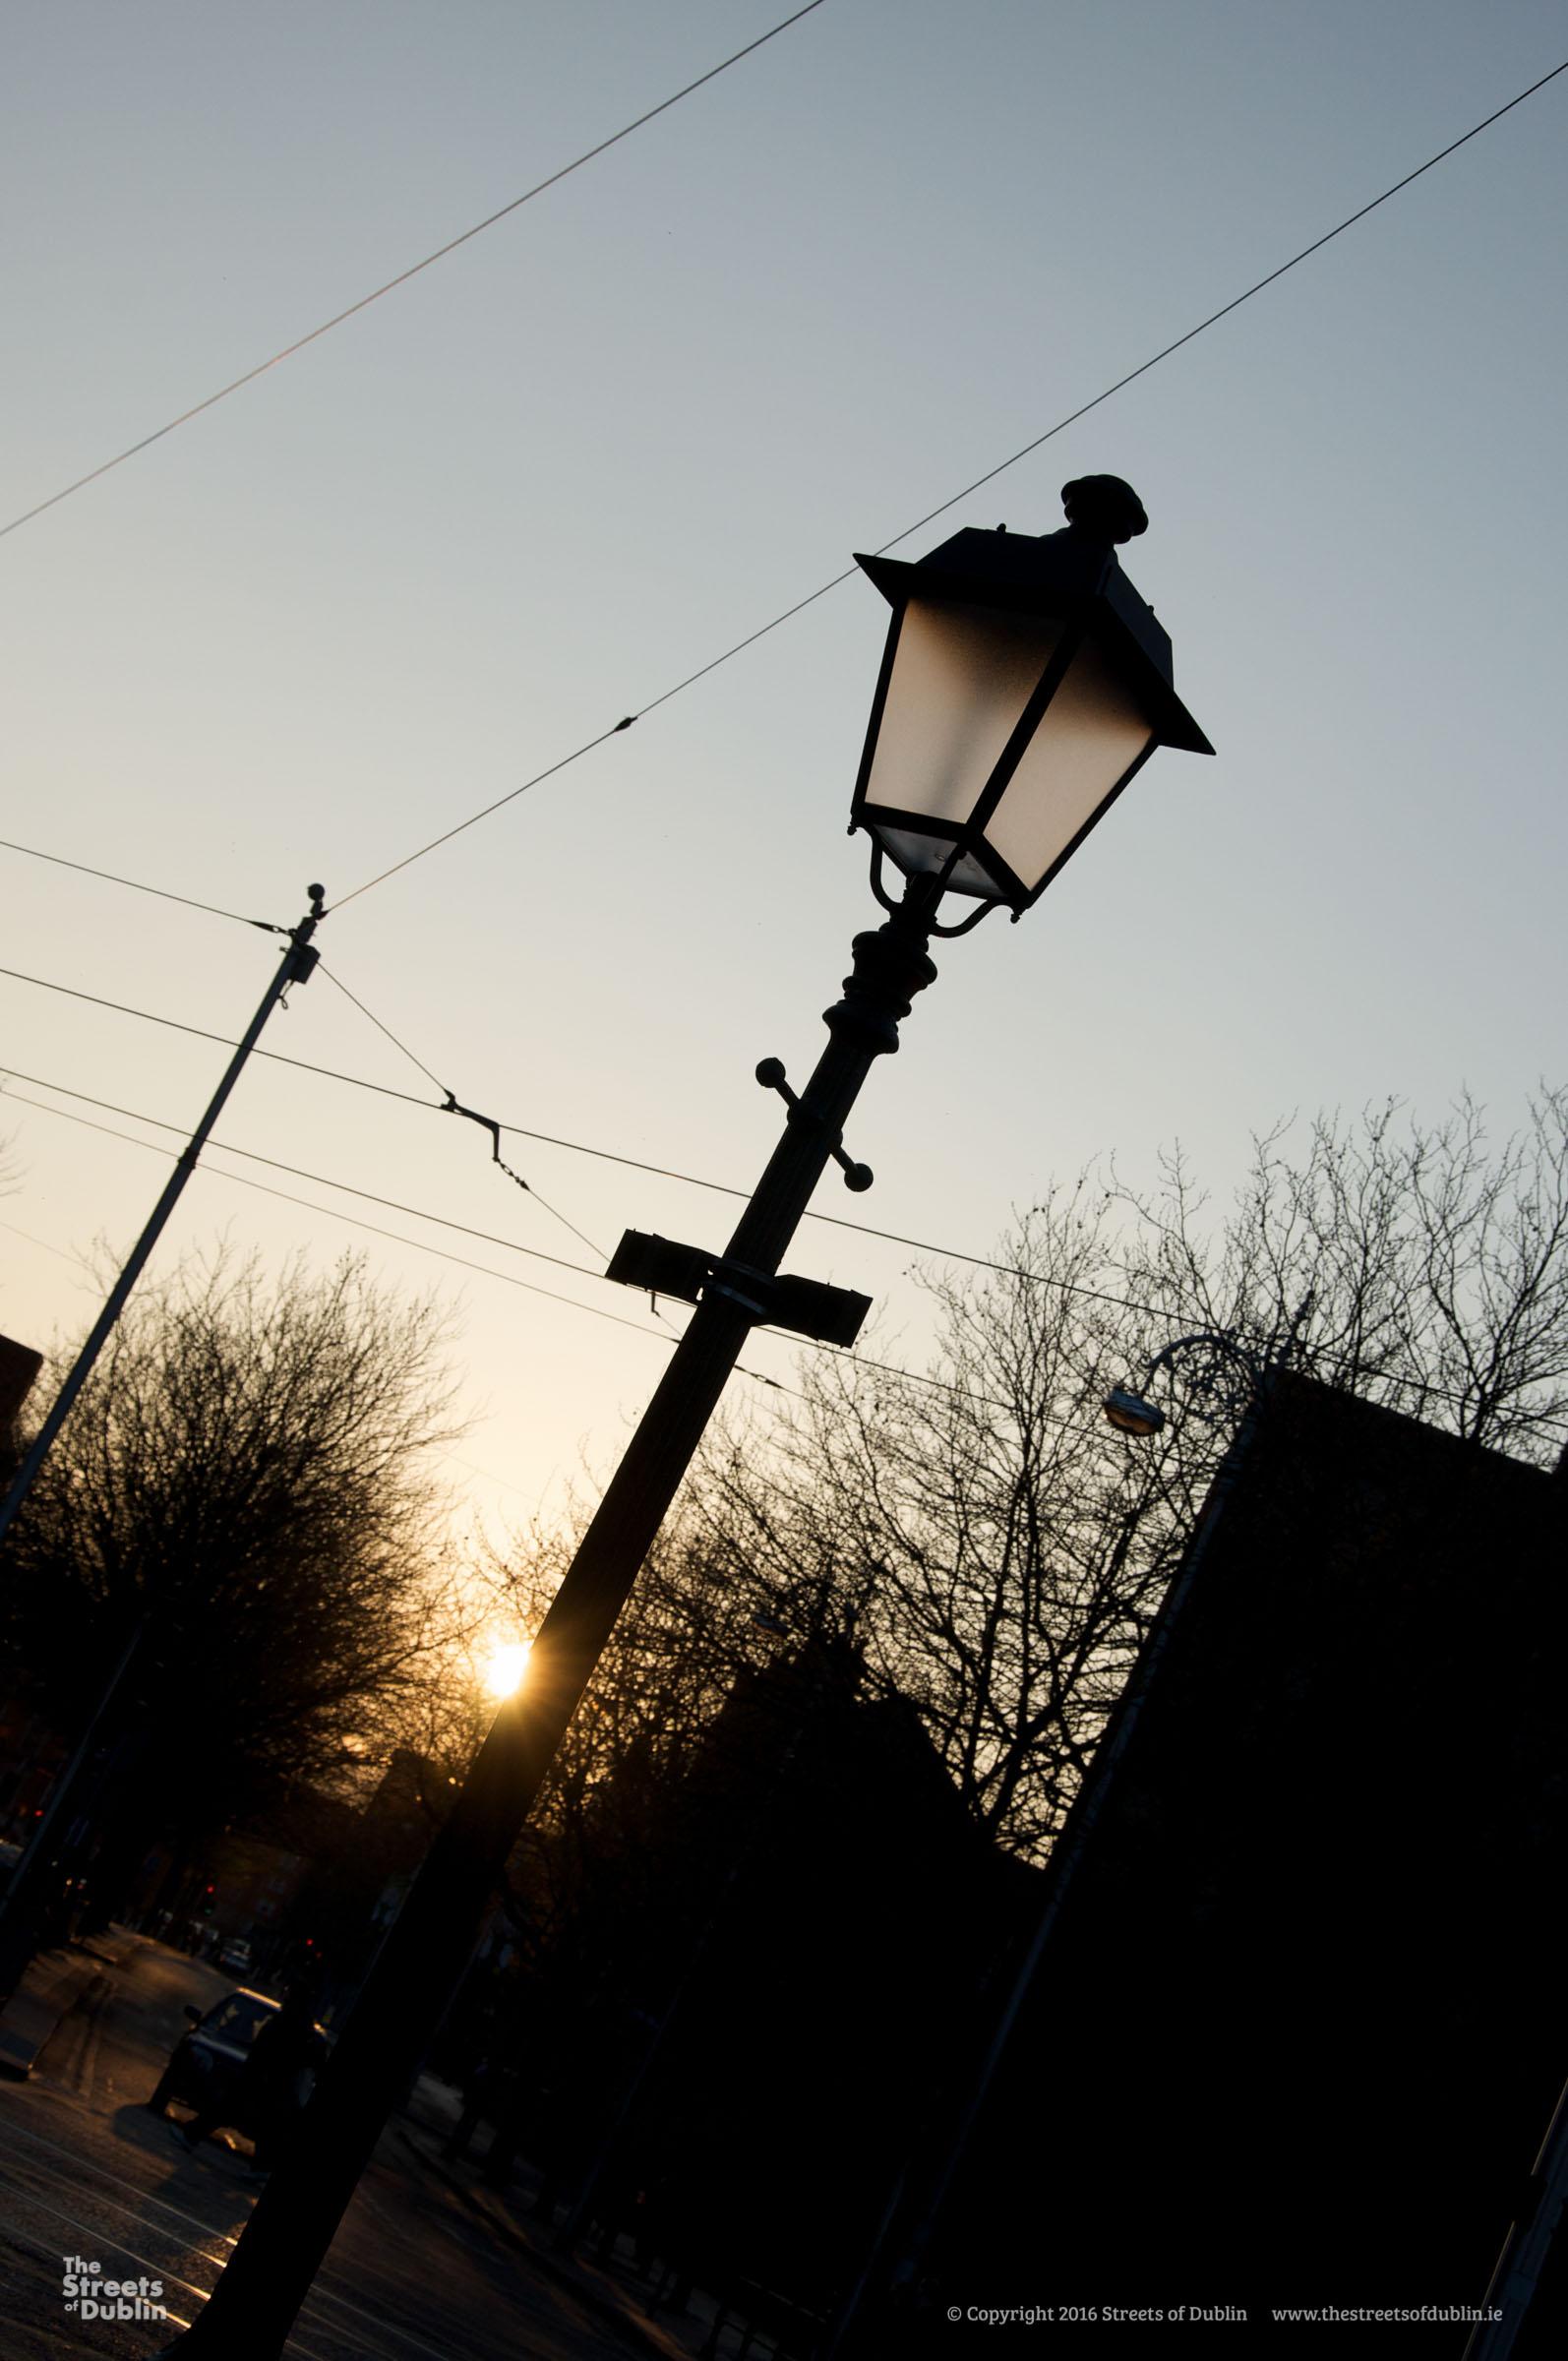 Streets-of-Dublin-Photo--22.jpg